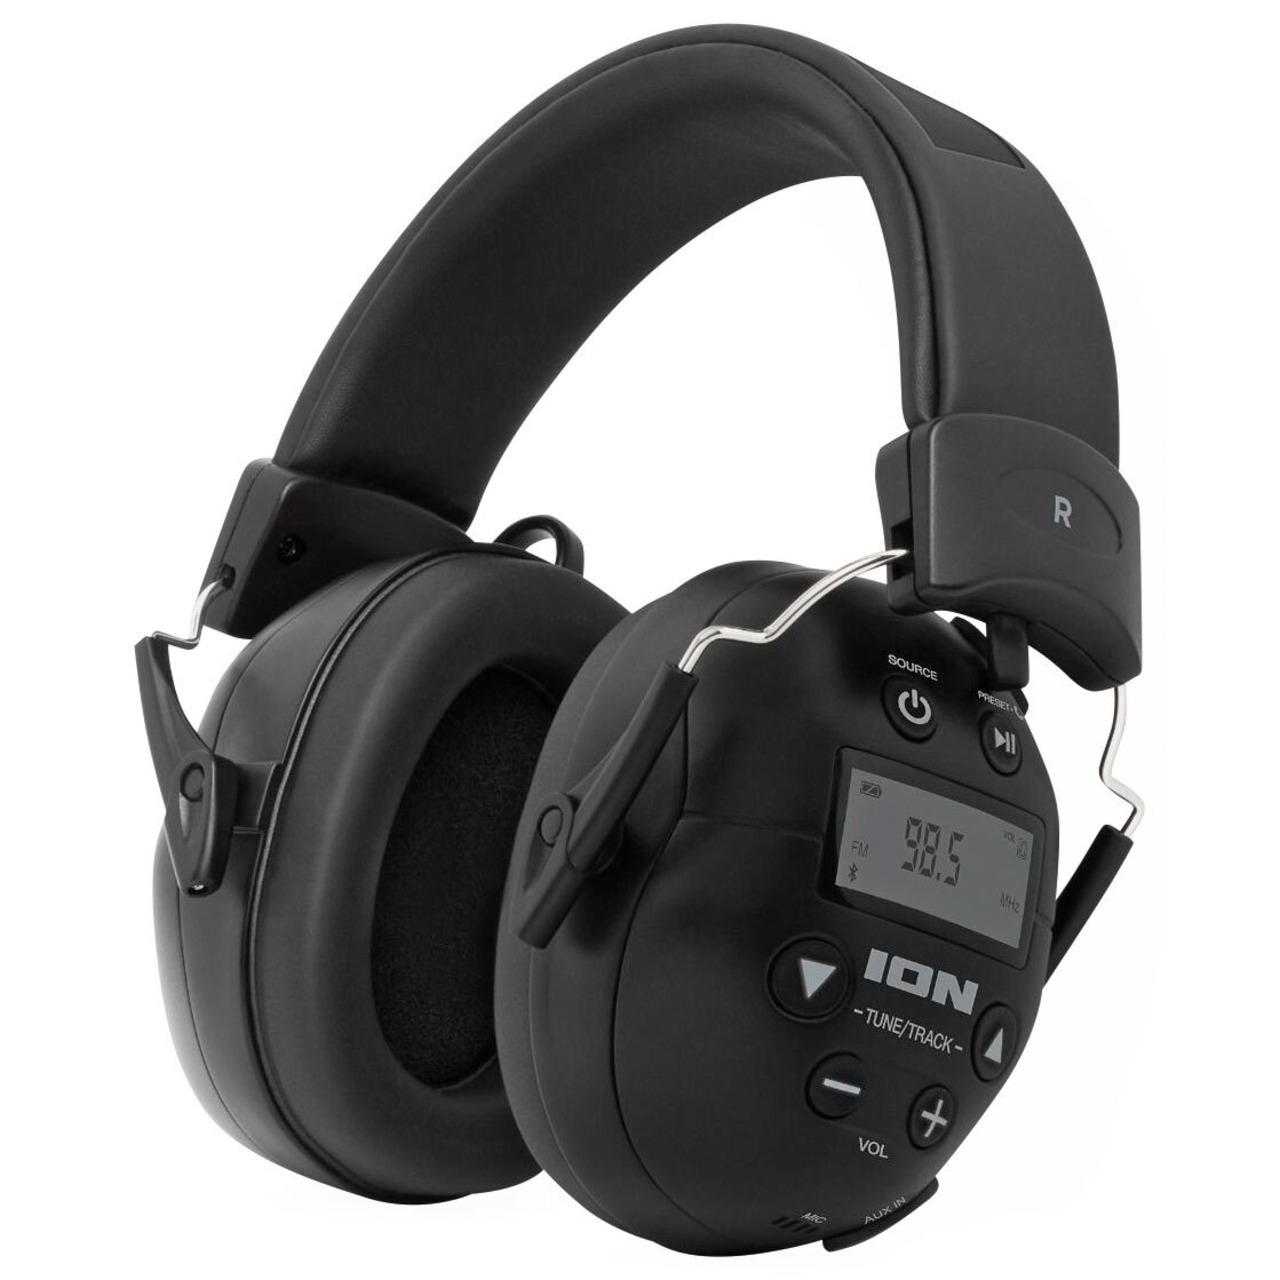 ION Audio Kapselgehörschutz-Kopfhörer Tough Sounds 2- Bluetooth- Radio- Akku- 27 dB NRR